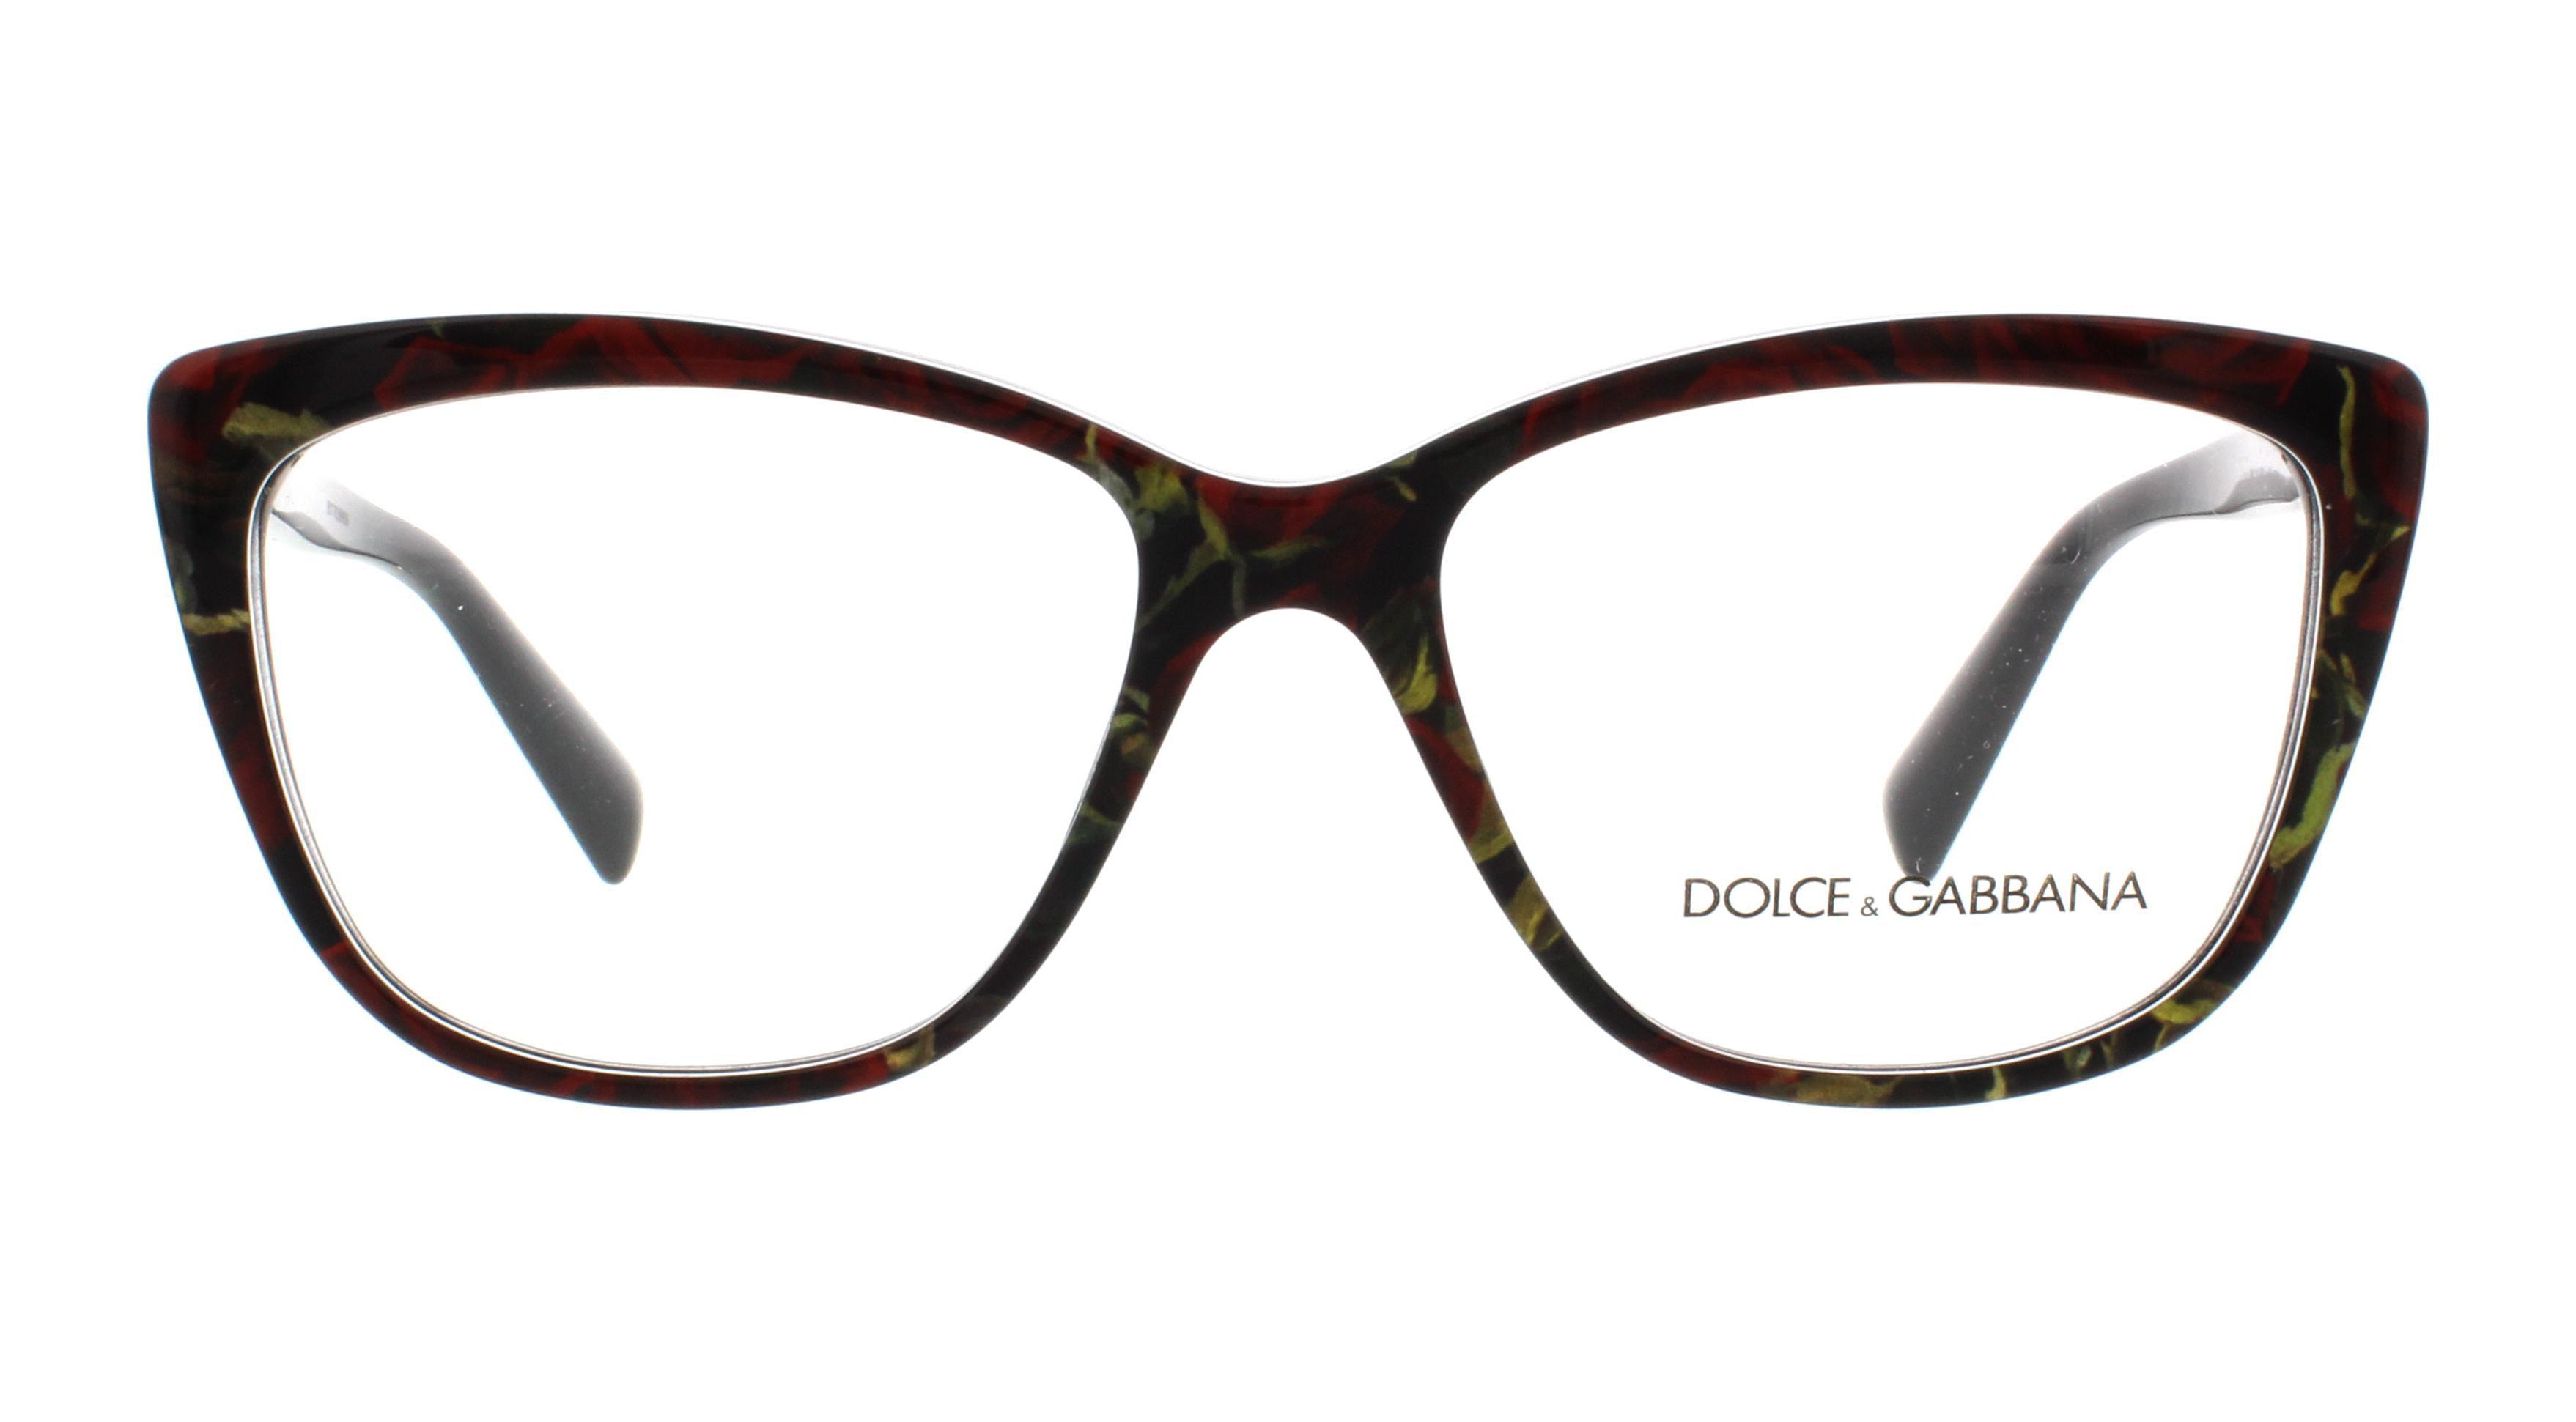 22575b7b8ad DOLCE   GABBANA Eyeglasses DG3190 2938 Printing Roses On Black 54MM -  Walmart.com